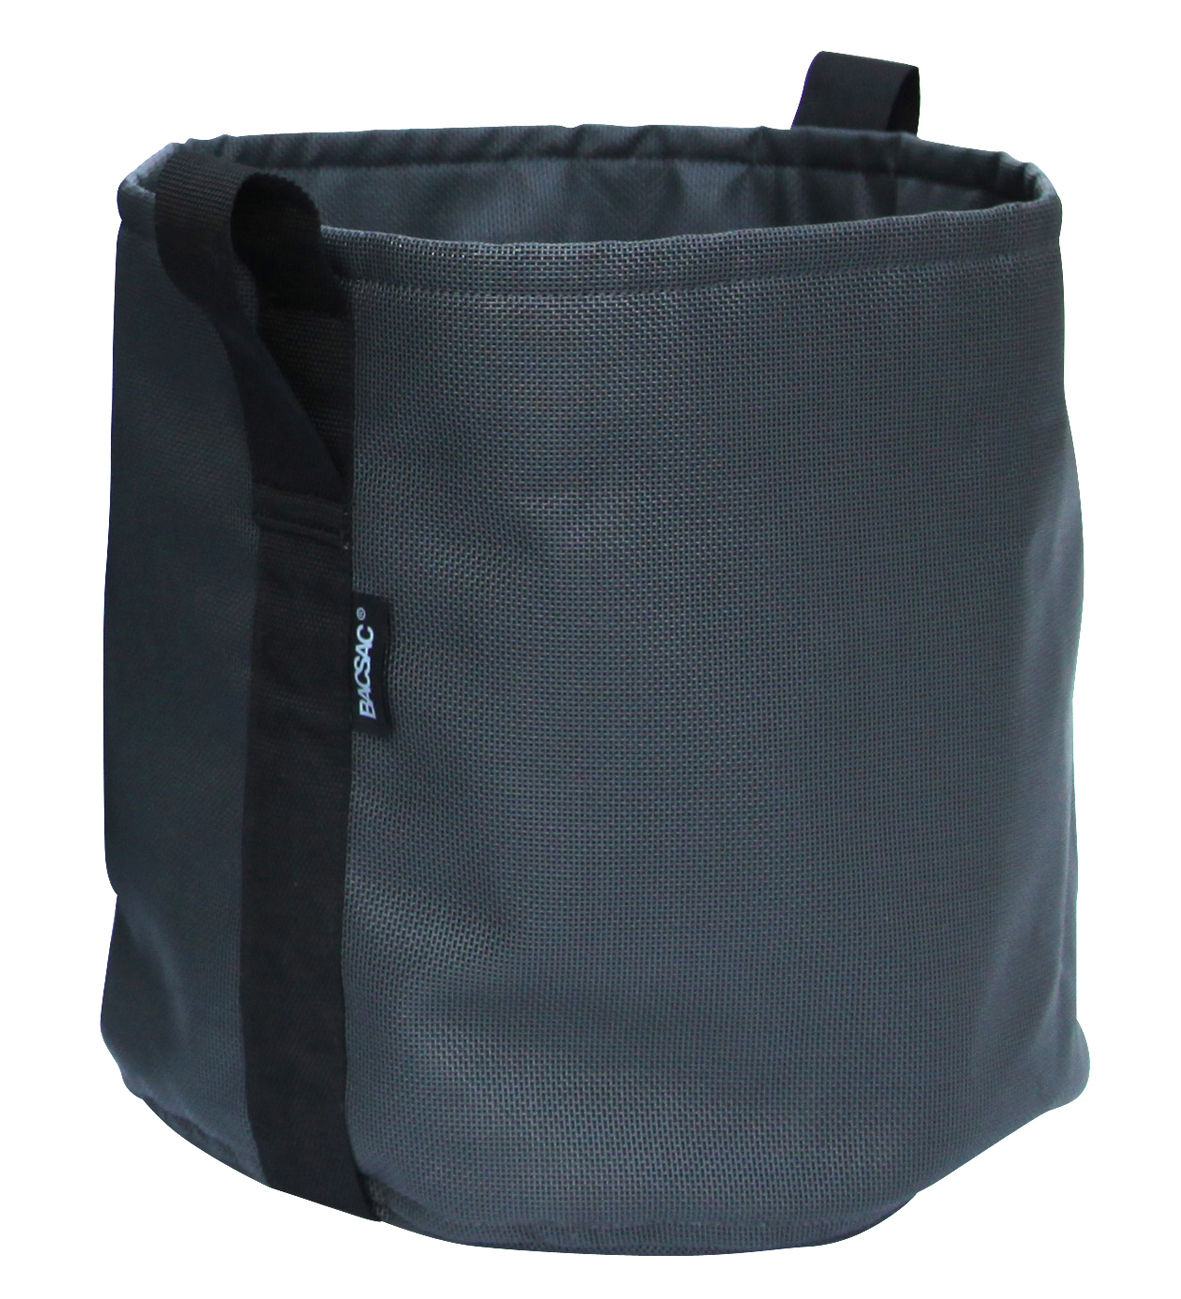 Outdoor - Pots & Plants - Batyline® Flowerpot - Outdoor - 25 L by Bacsac - Black asphalt - Batyline® fabric